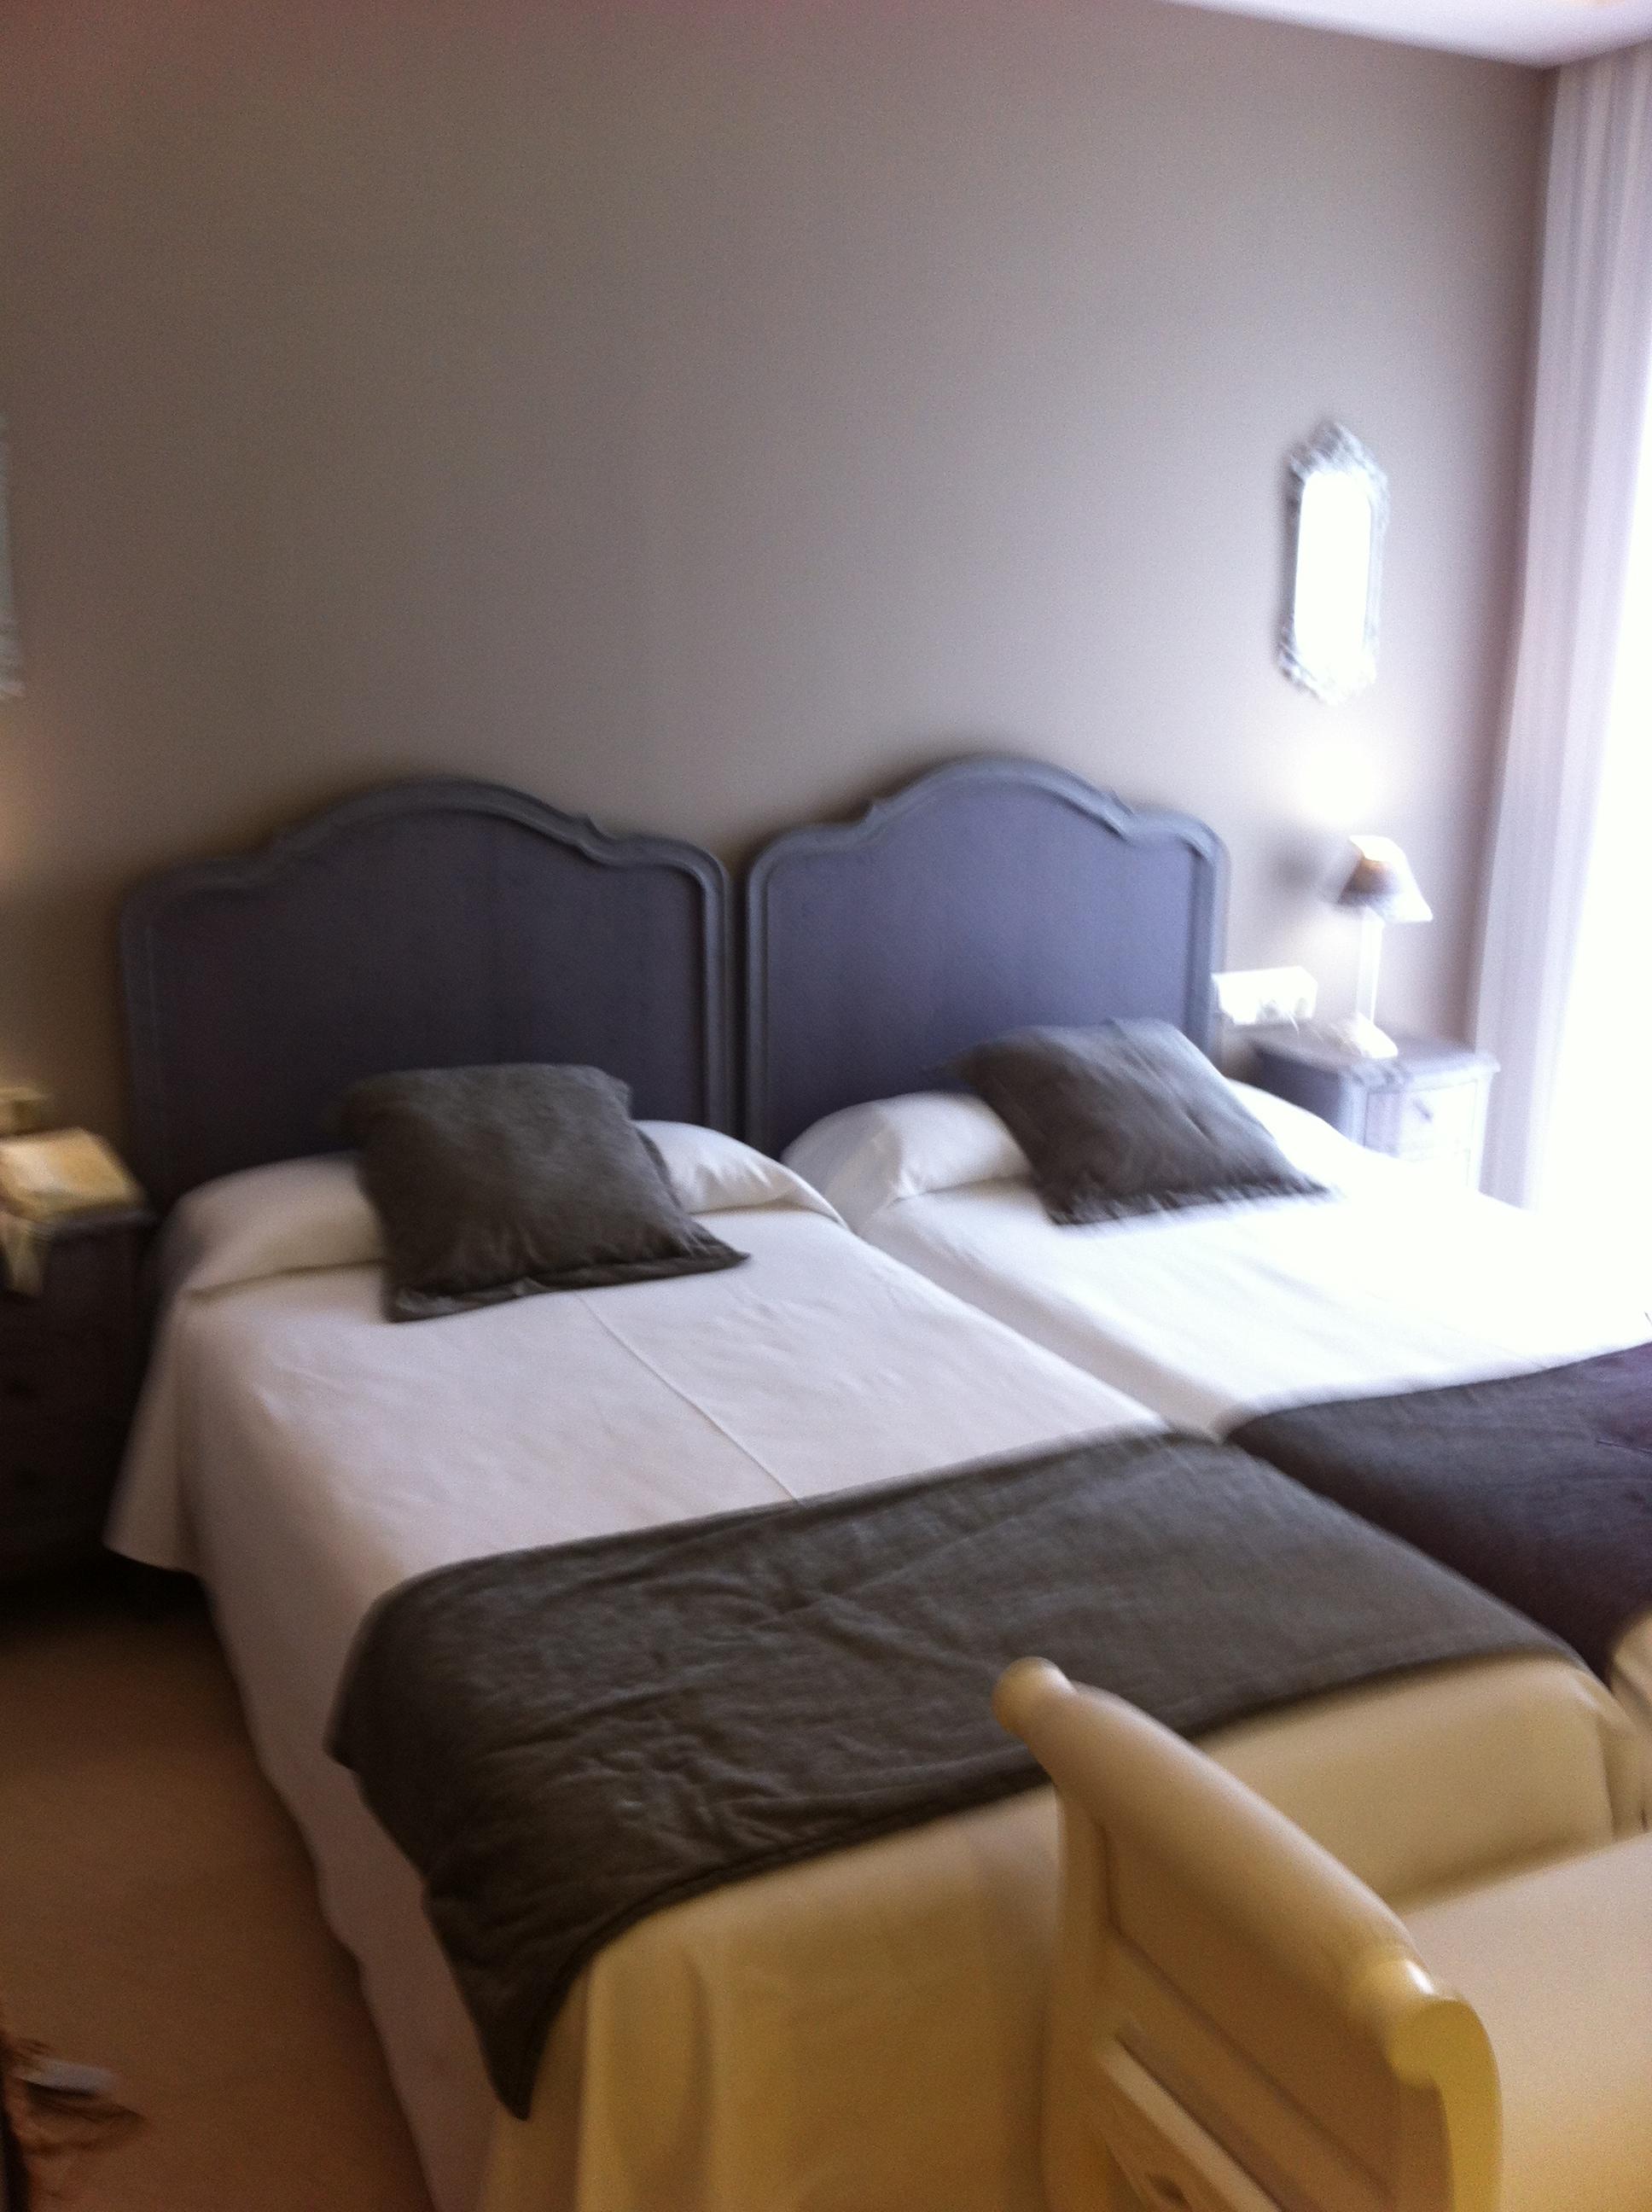 Hotel Ceferino Vilanova Muebles Almazan # Ceferino Muebles